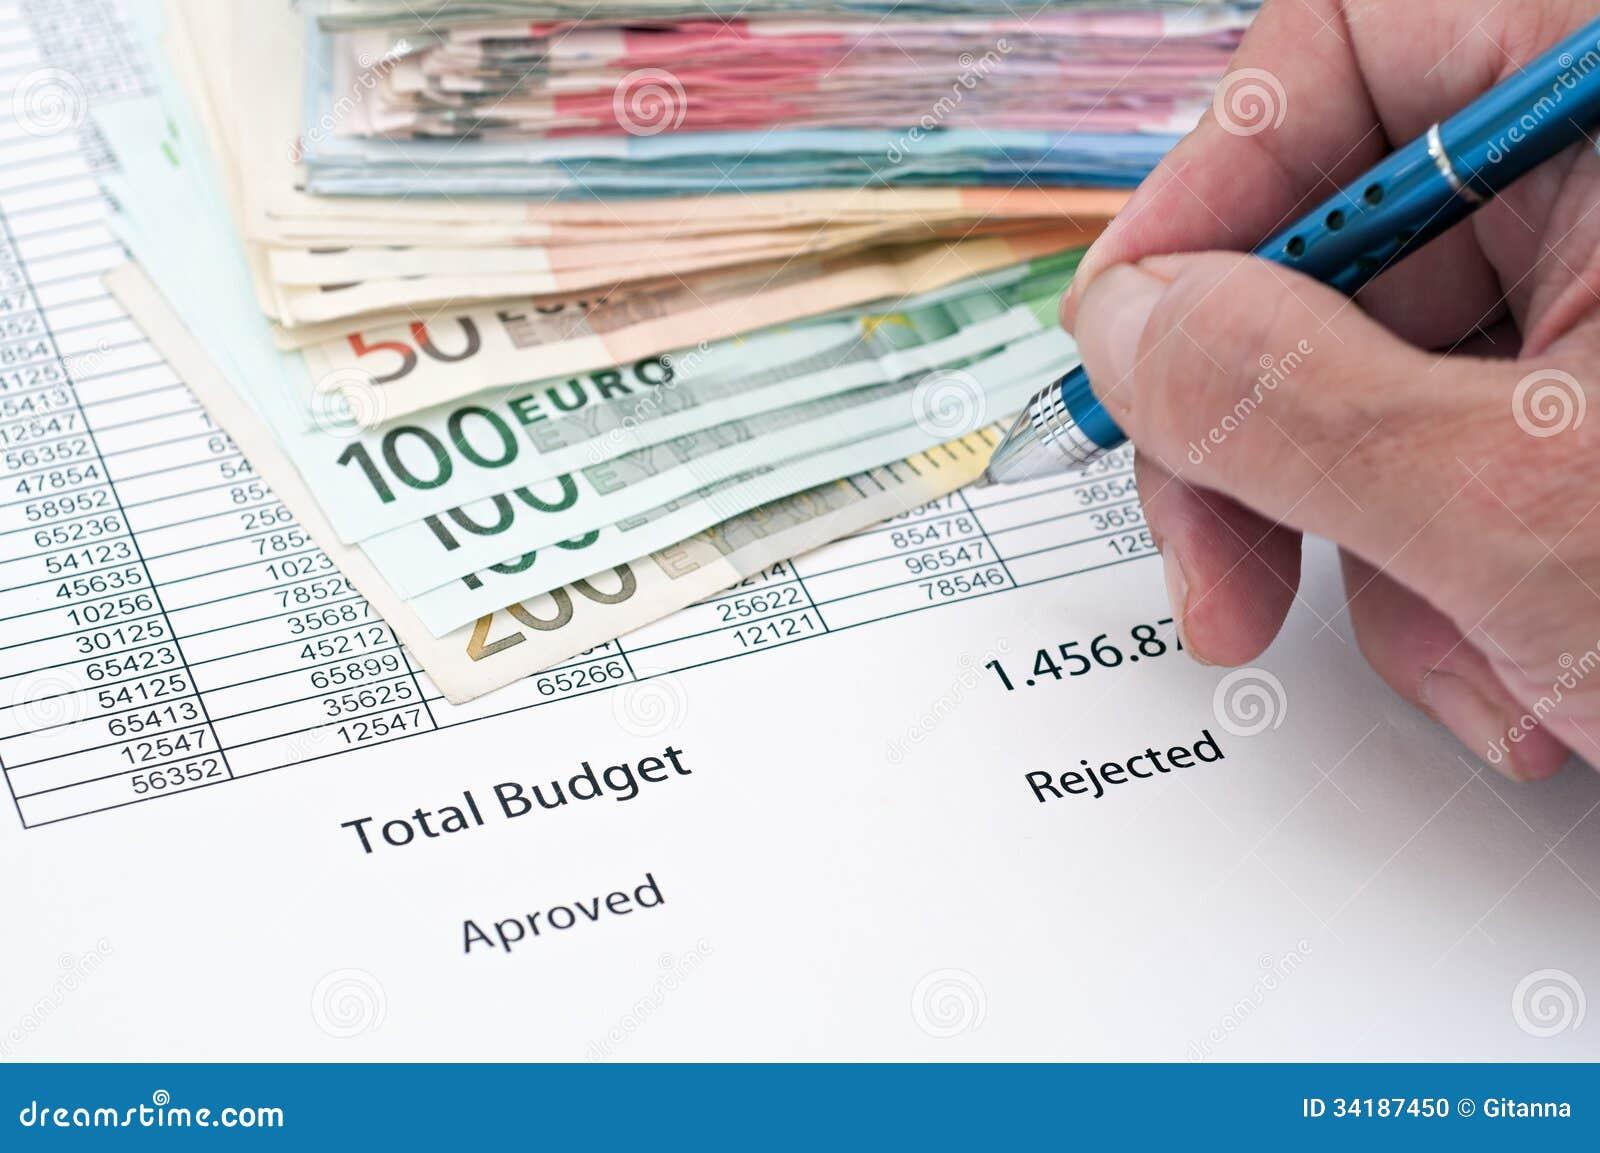 Budget detail